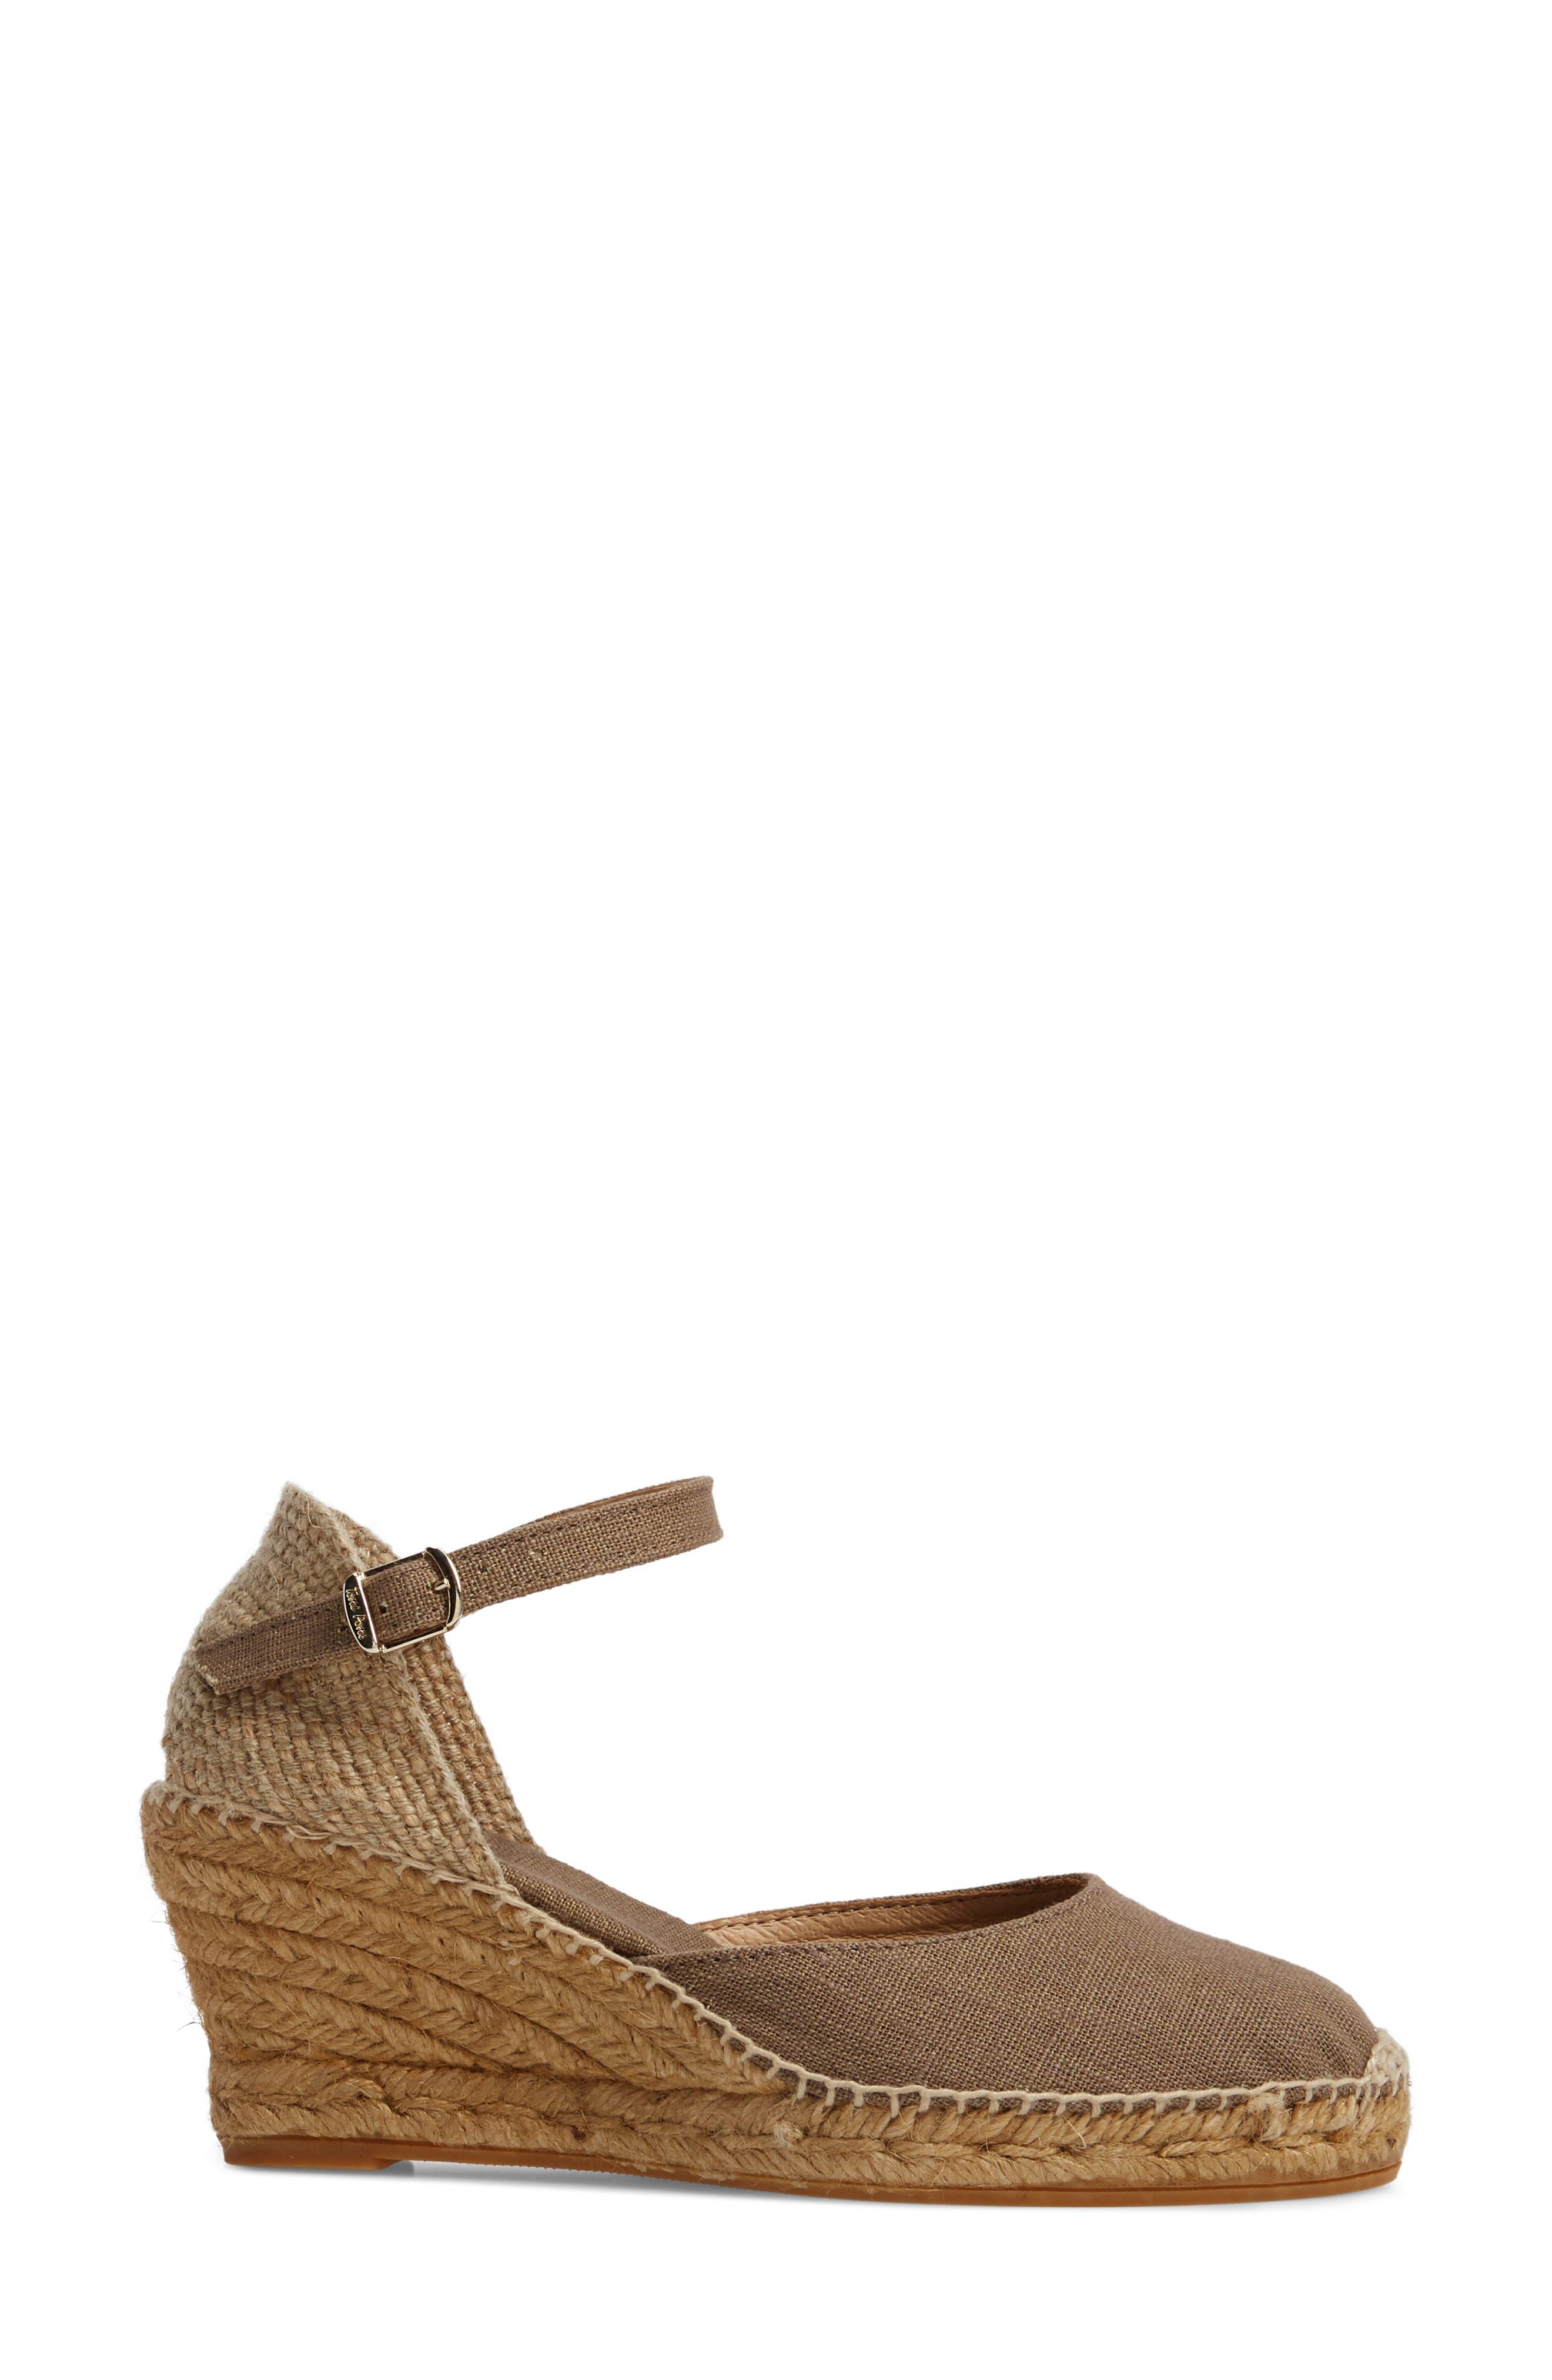 Alternate Image 3  - Toni Pons 'Caldes' Linen Wedge Sandal (Women)